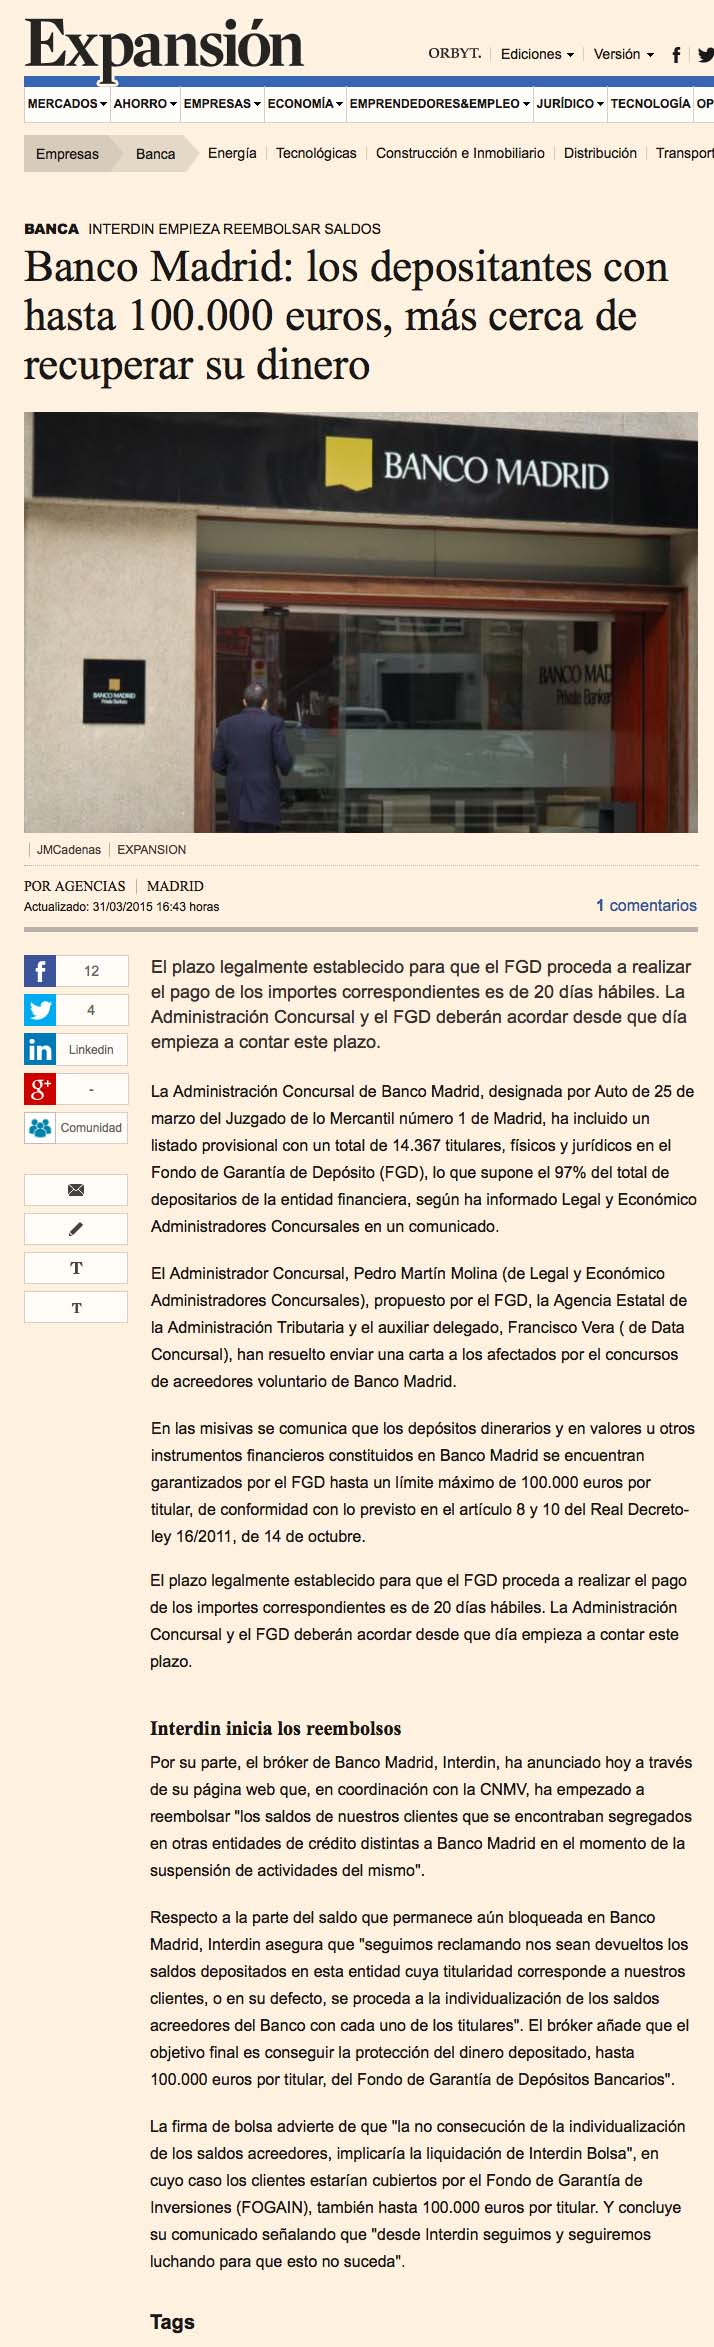 banco-madrid-expansion-312x1024